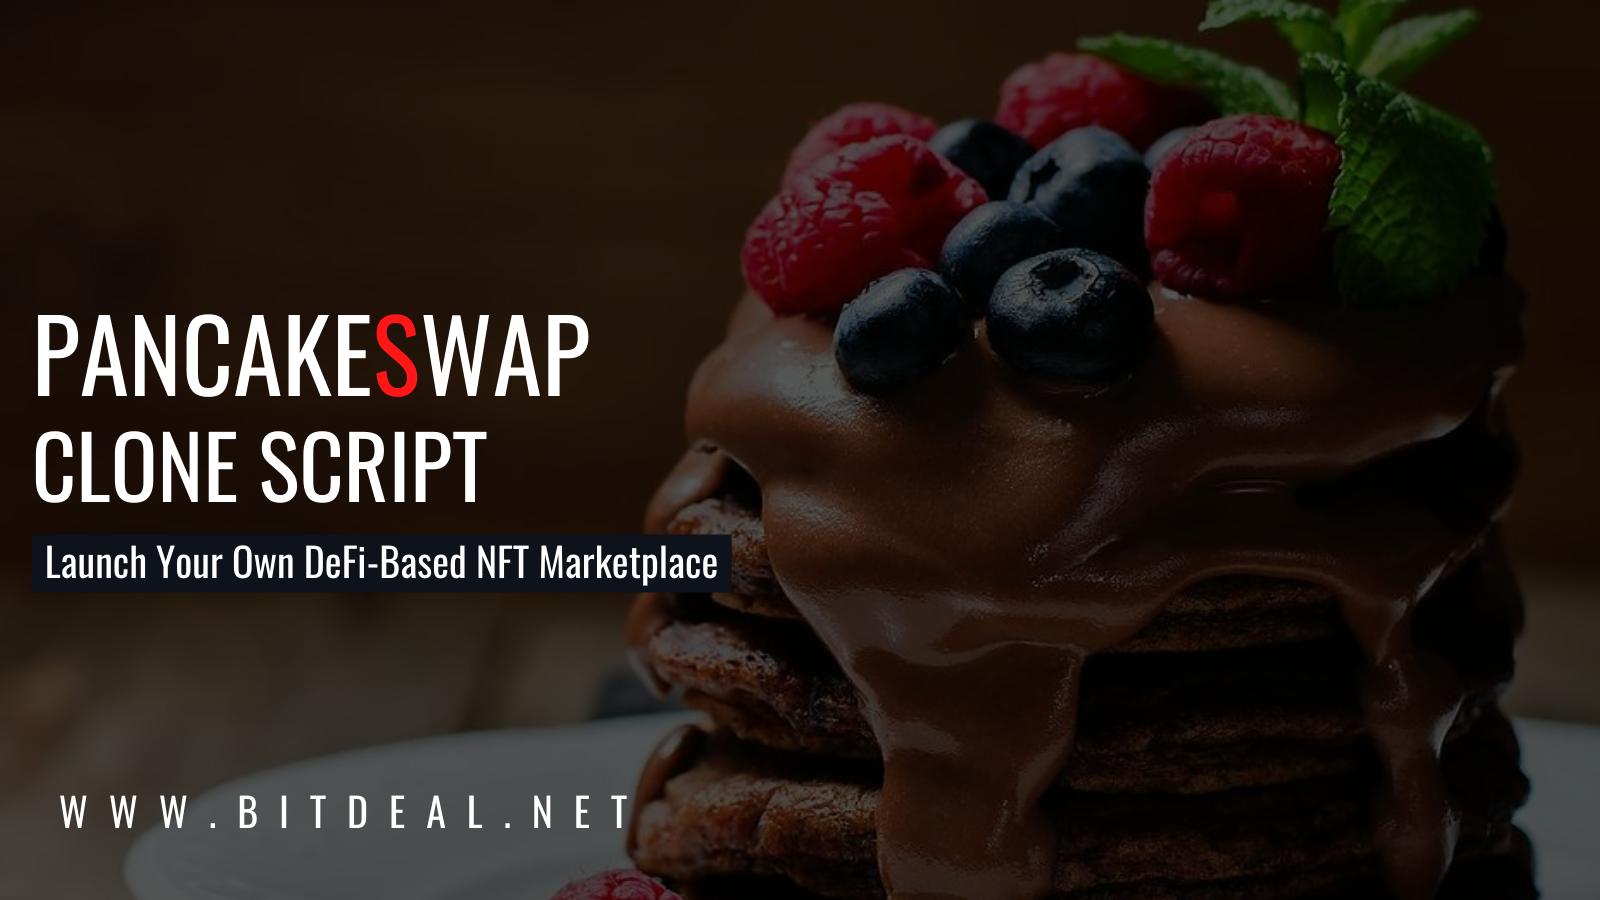 PANCAKESWAP CLONE SCRIPT  Launch Your Own DeFi-Based NFT Marketplace  WWW .BITDEAL.NET